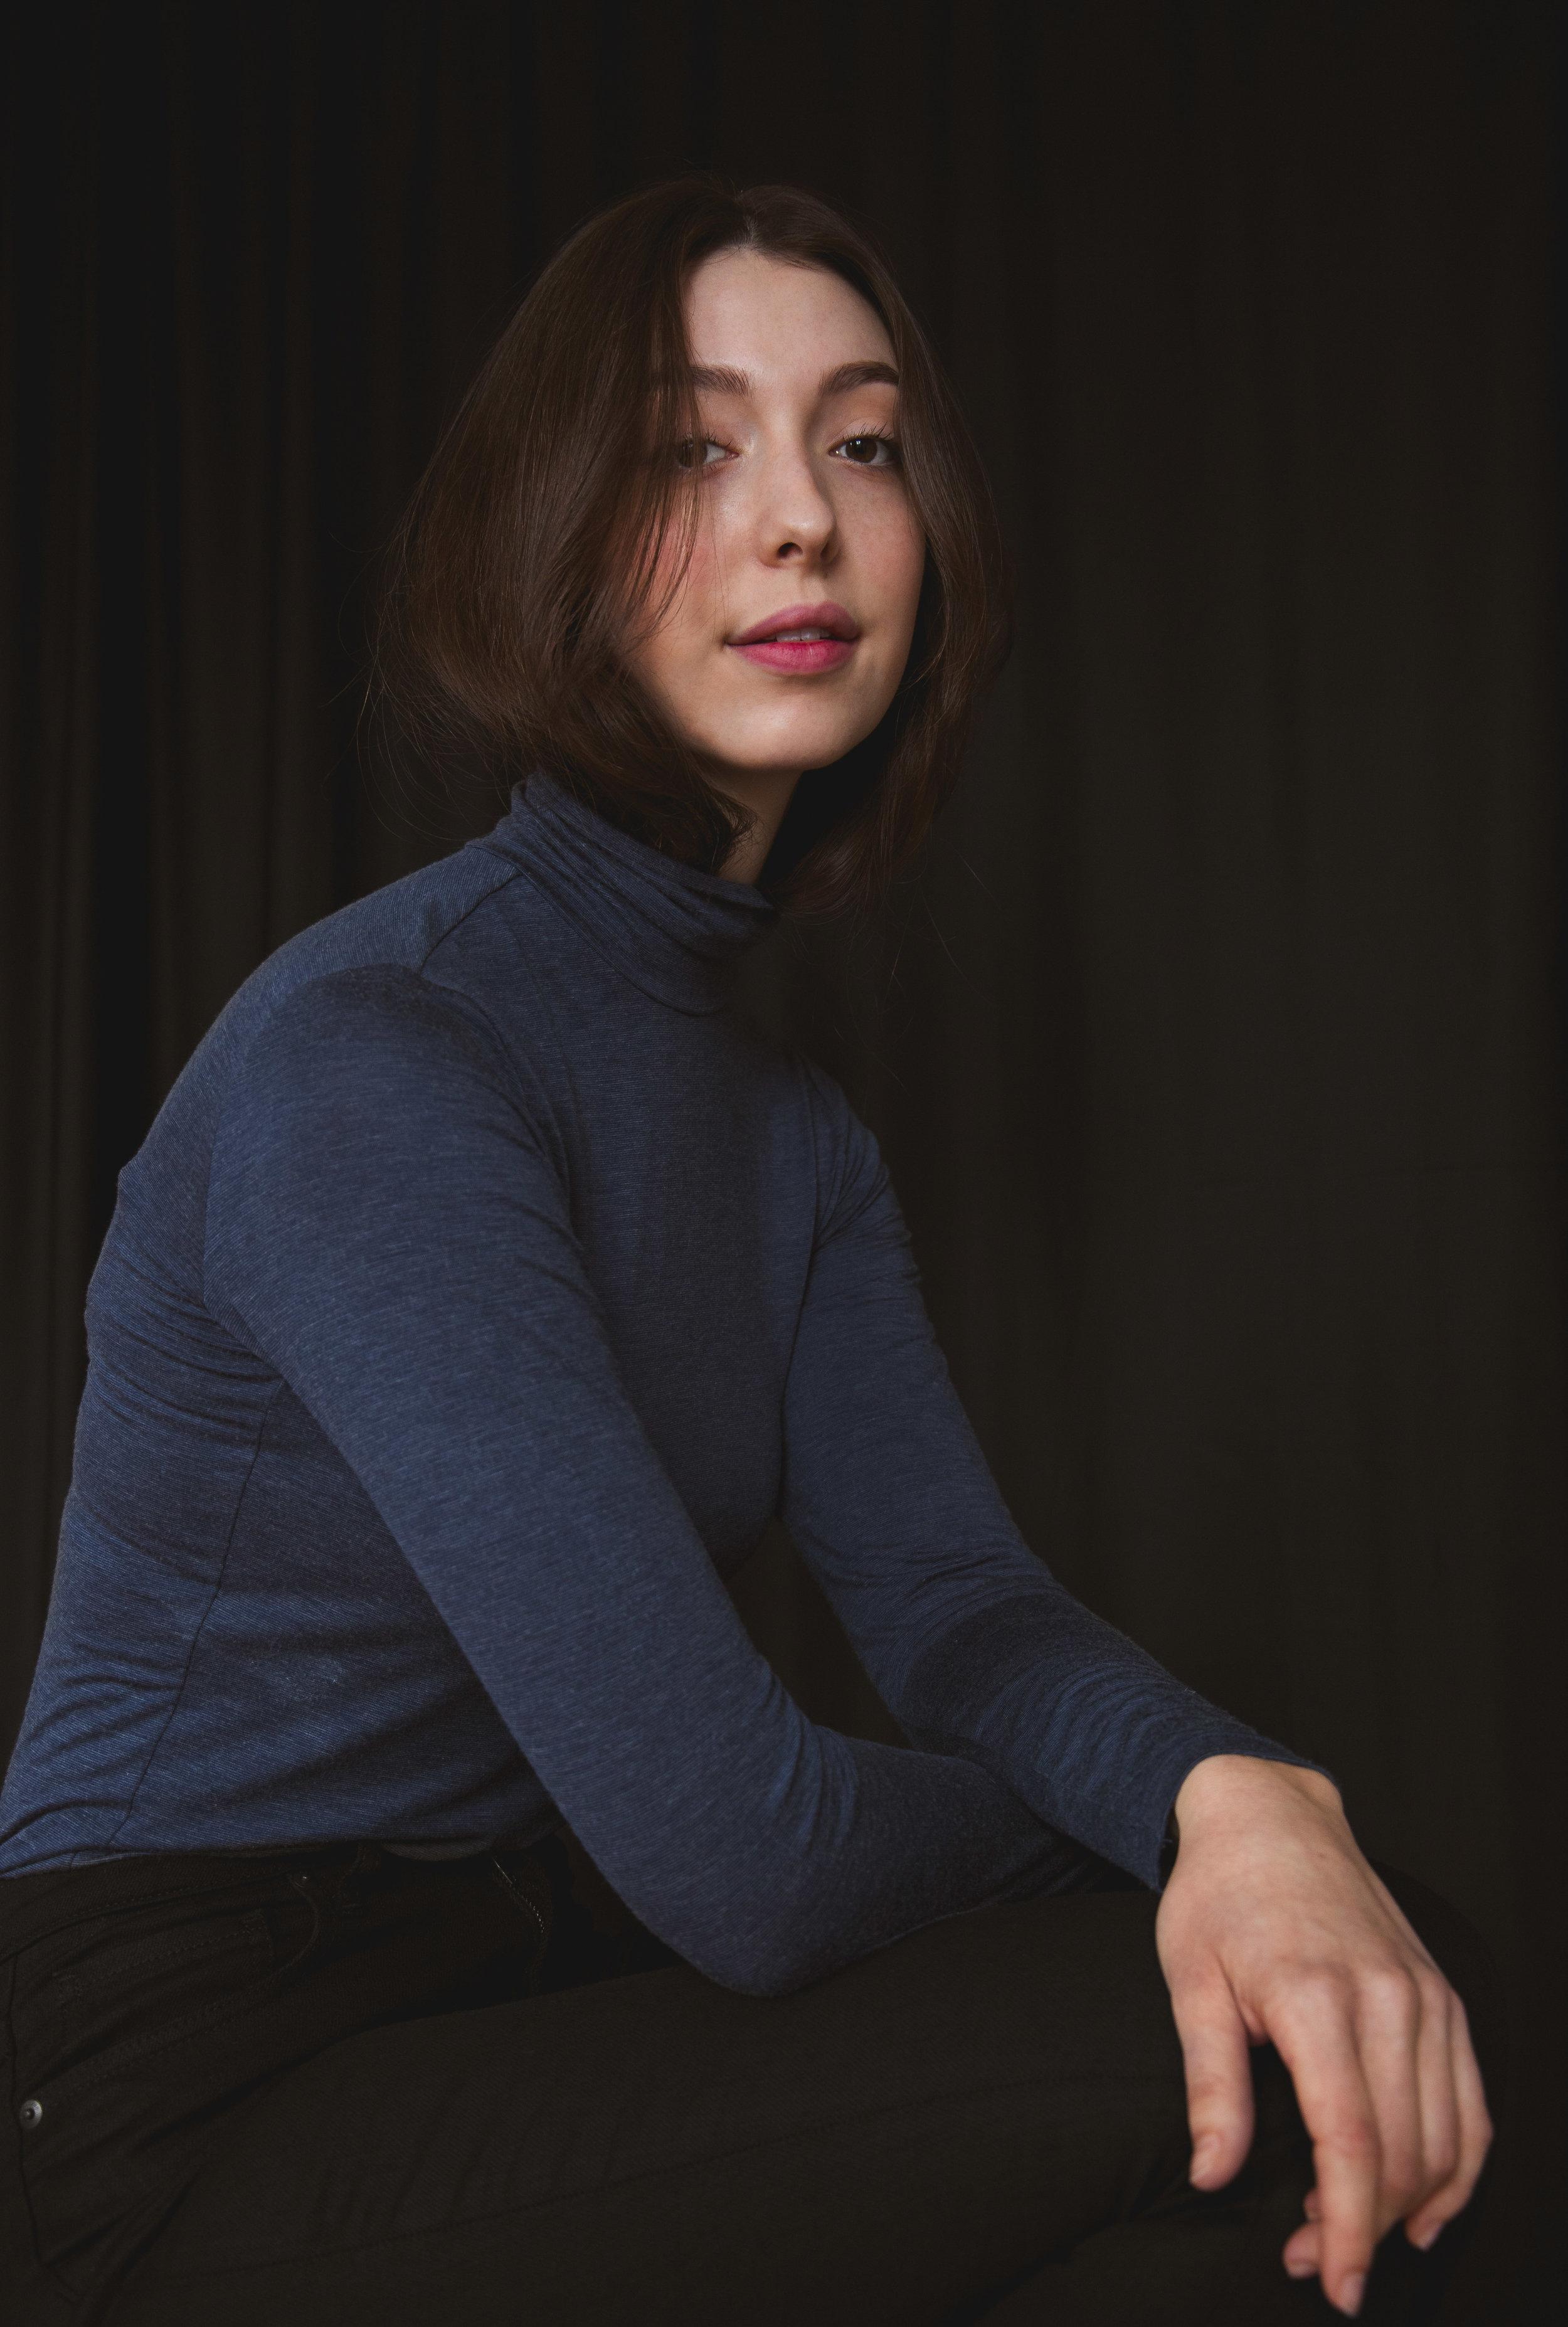 Samantha swenson - More